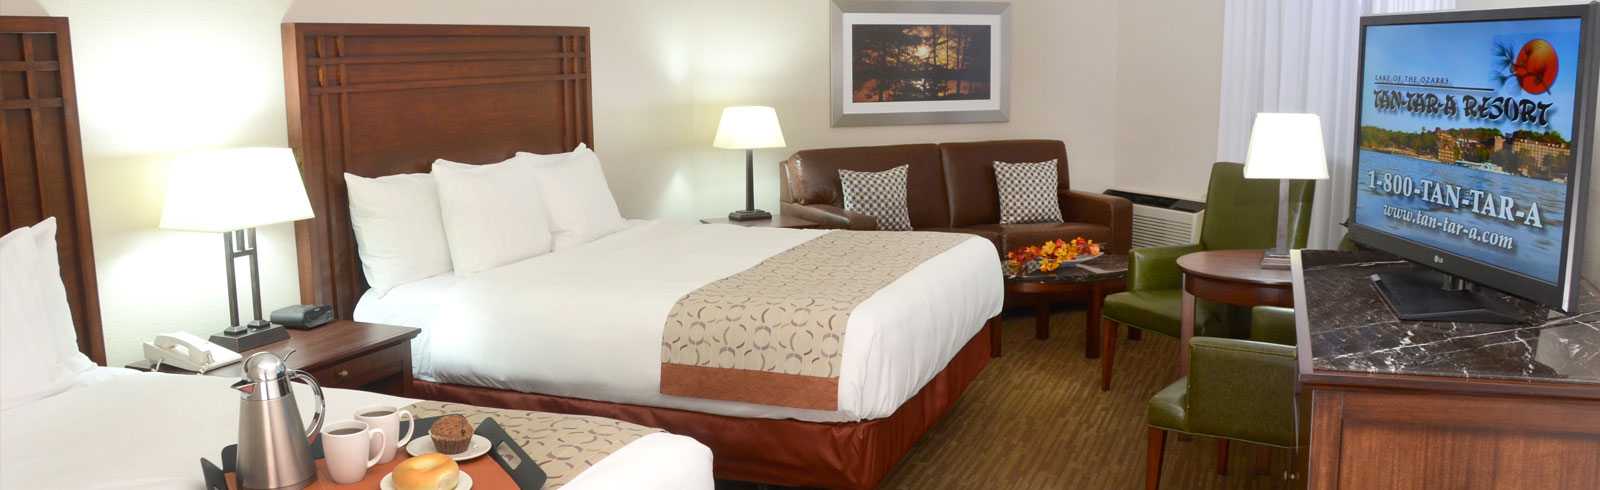 Rooms in Tan-Tar-A Resort, Osage Beach